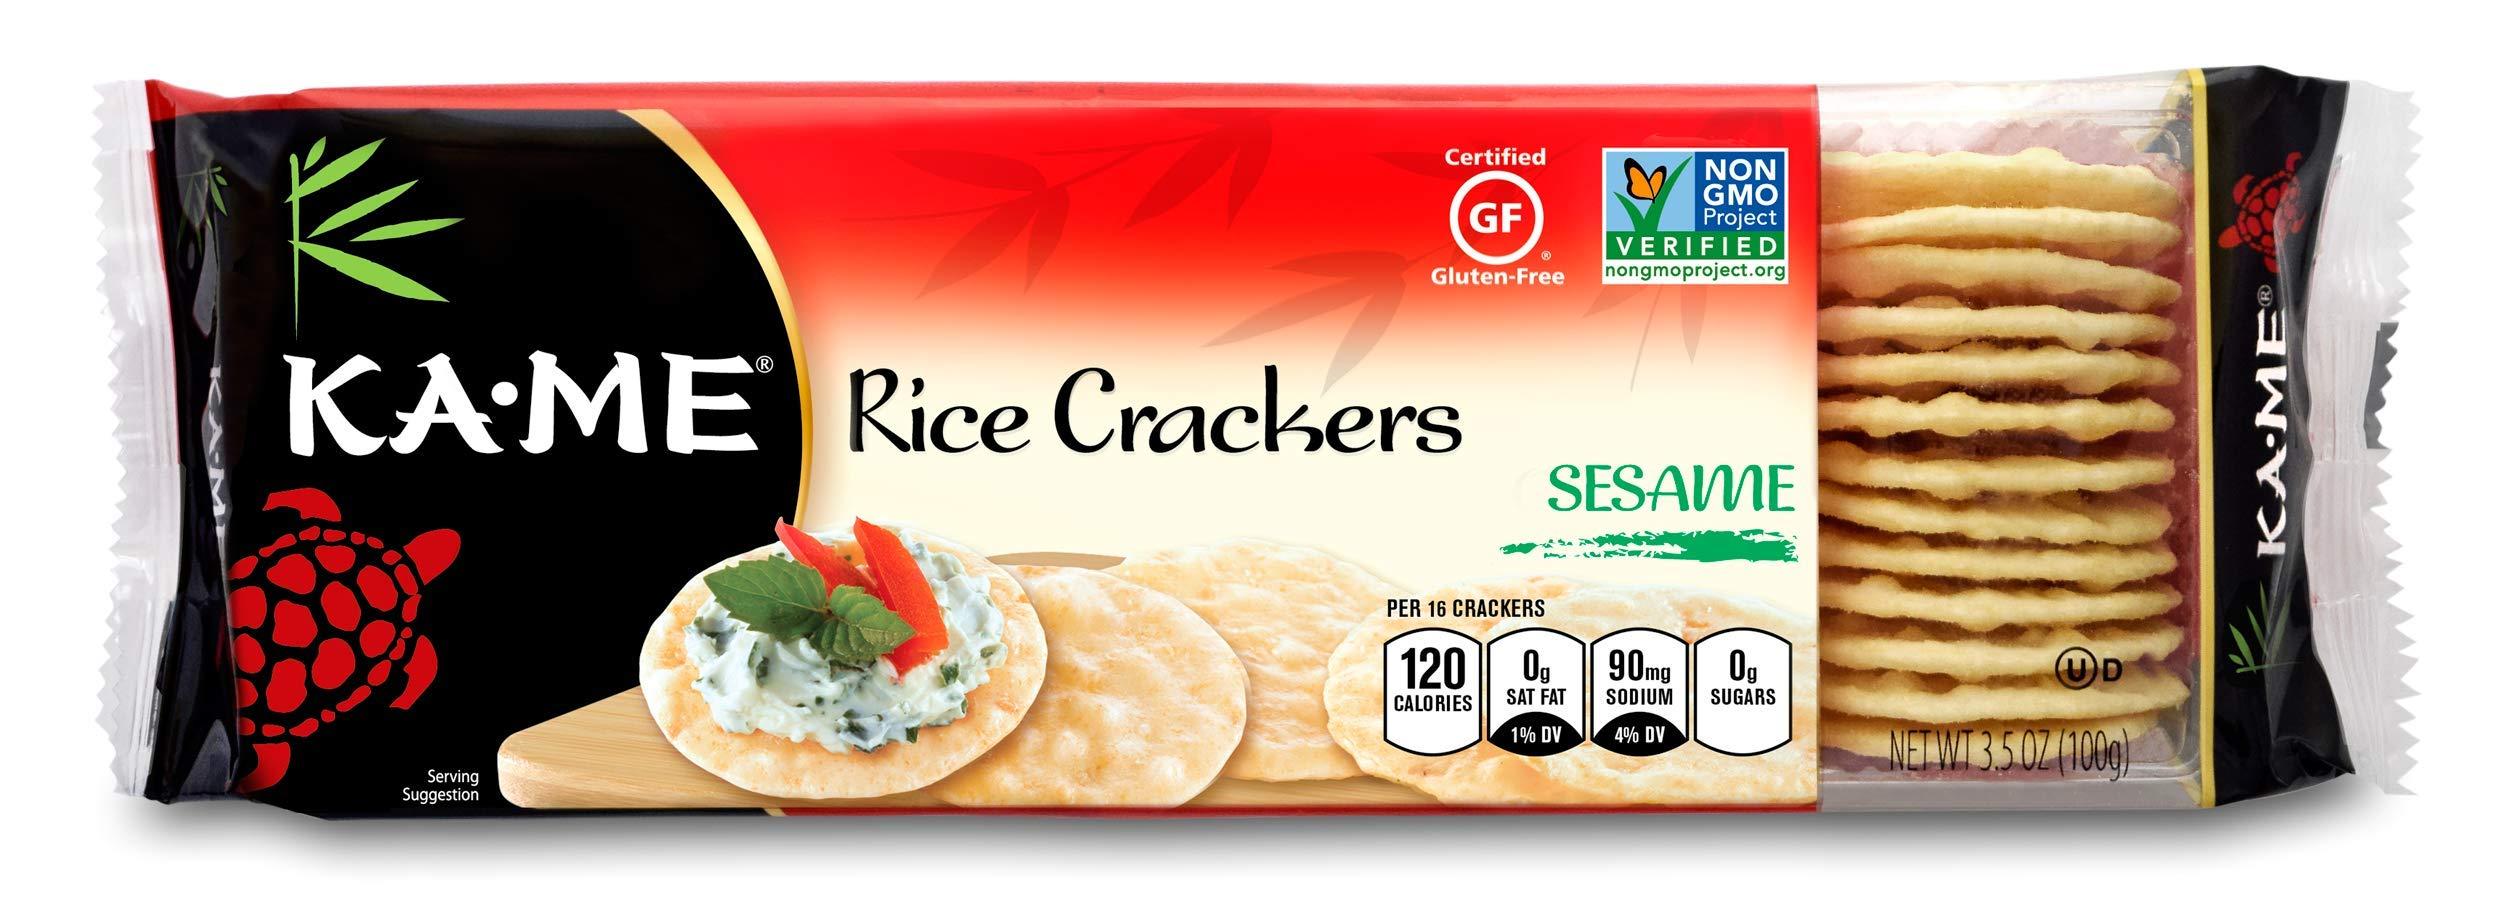 Ka-Me Gluten Free Rice Crackers, Sesame, 3.5 Ounce